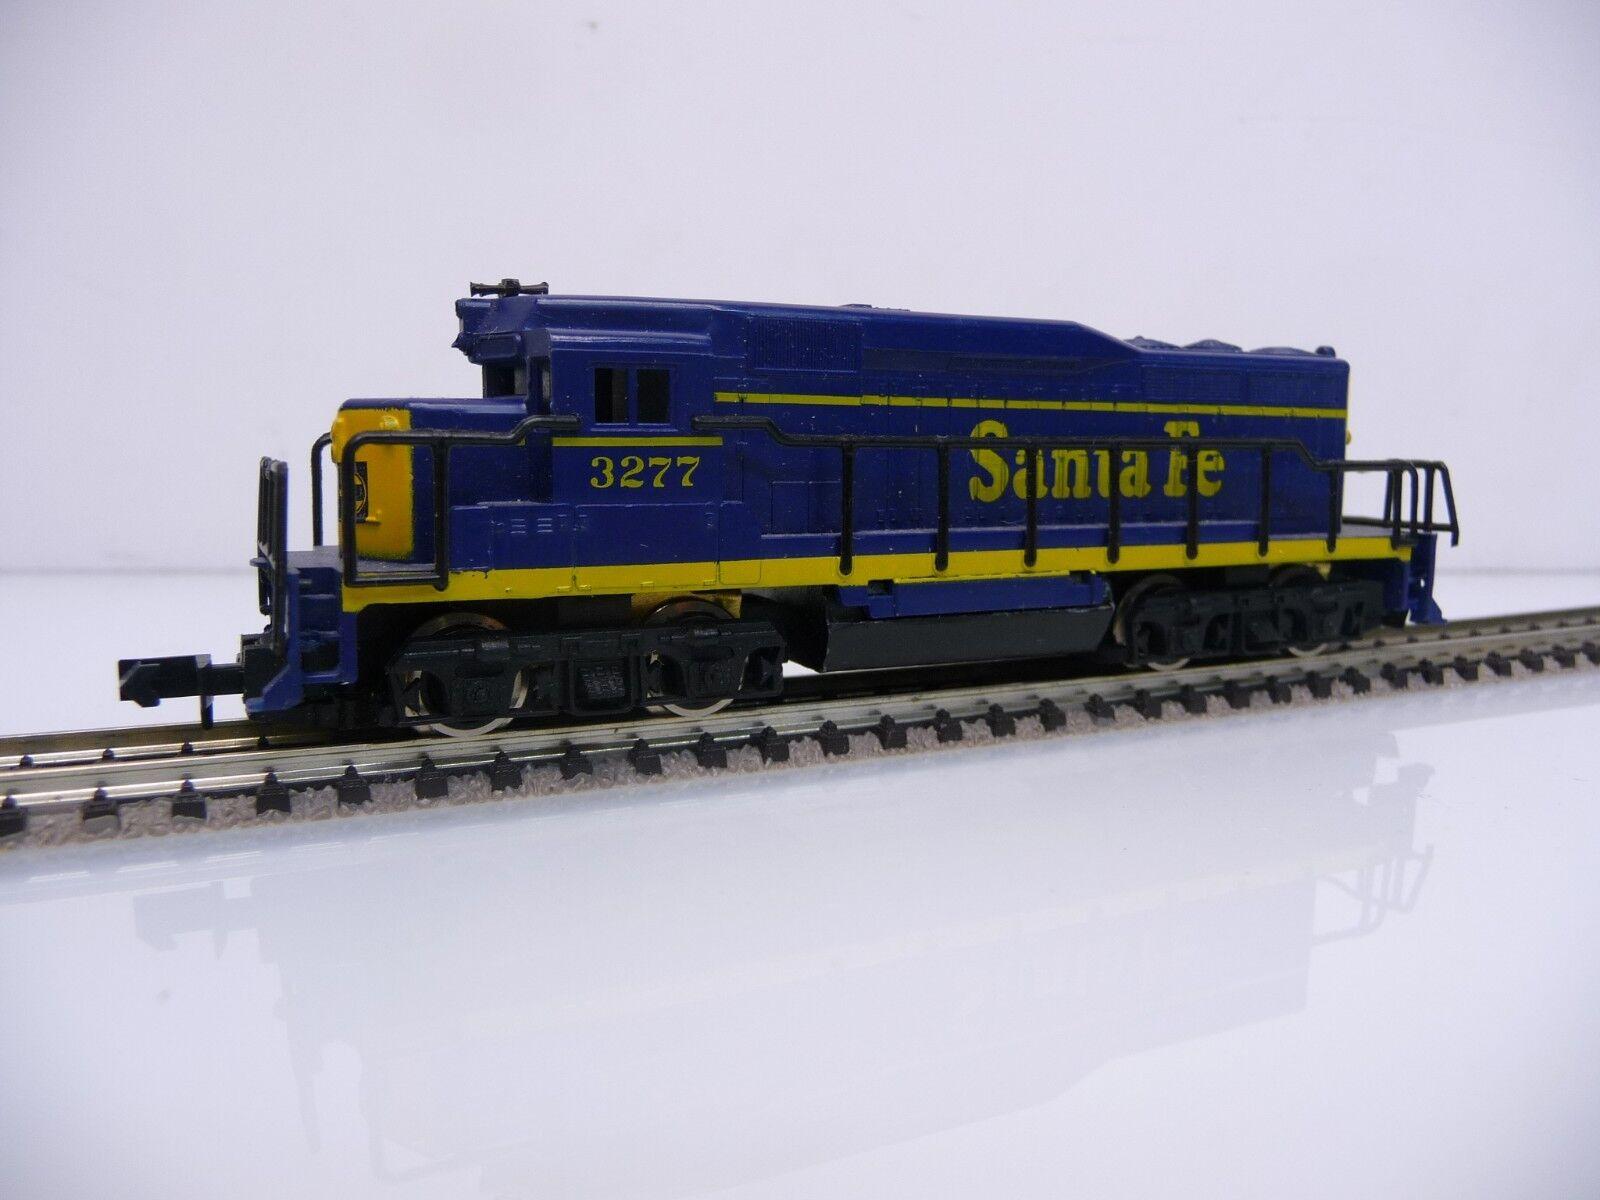 Arnold 5054 N 1 160 Diesellok Diesellok Diesellok BR GP 30 AT & SF Lok 3277 Ep. IV Guter Zustand dfb6c3